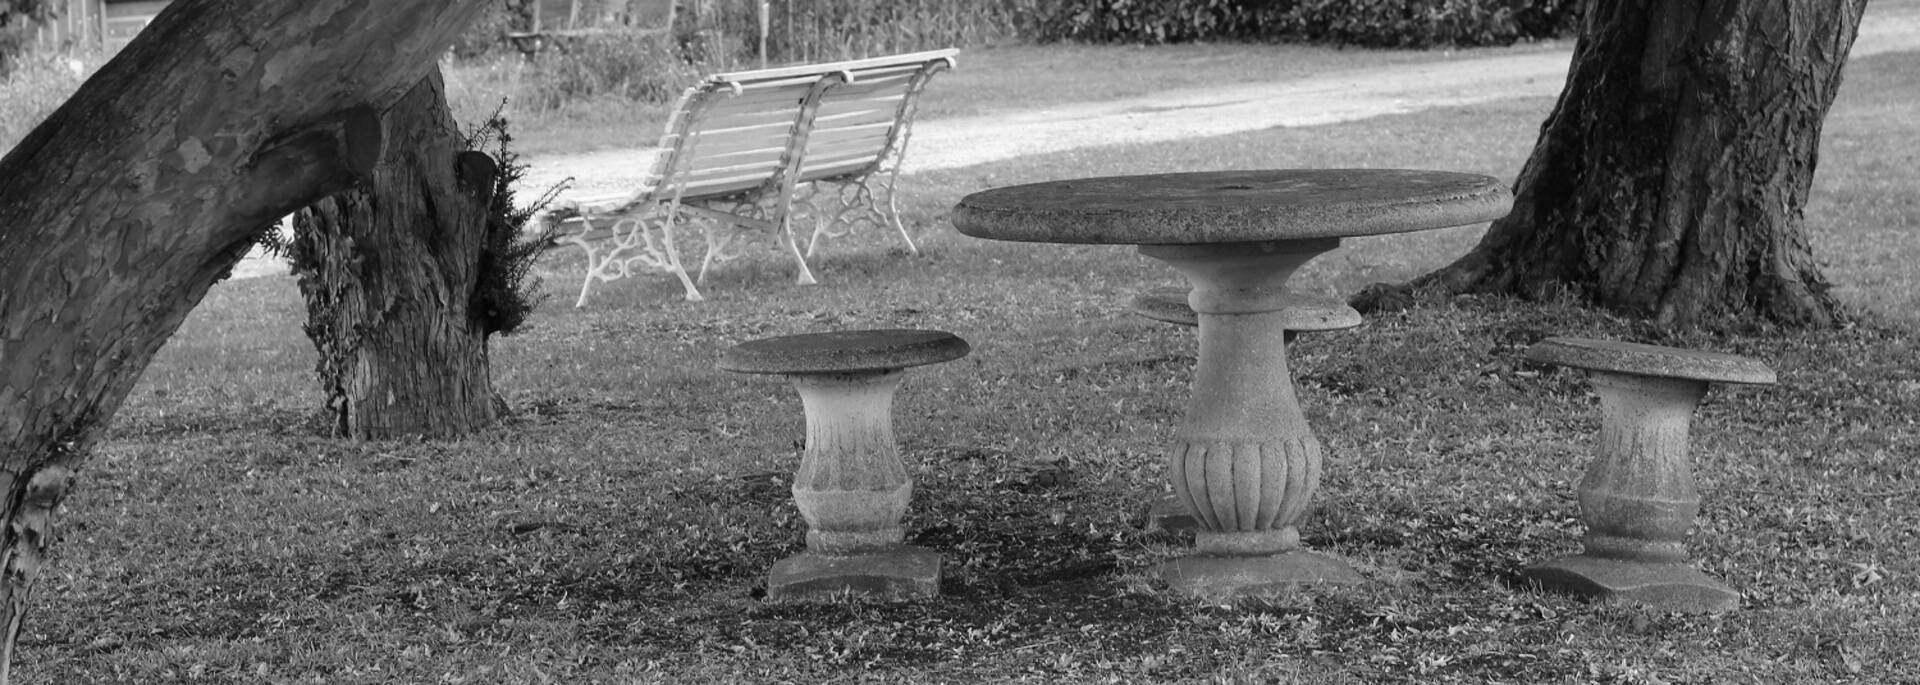 Jardins du château de Panloy - © P.Migaud / FDHPA17